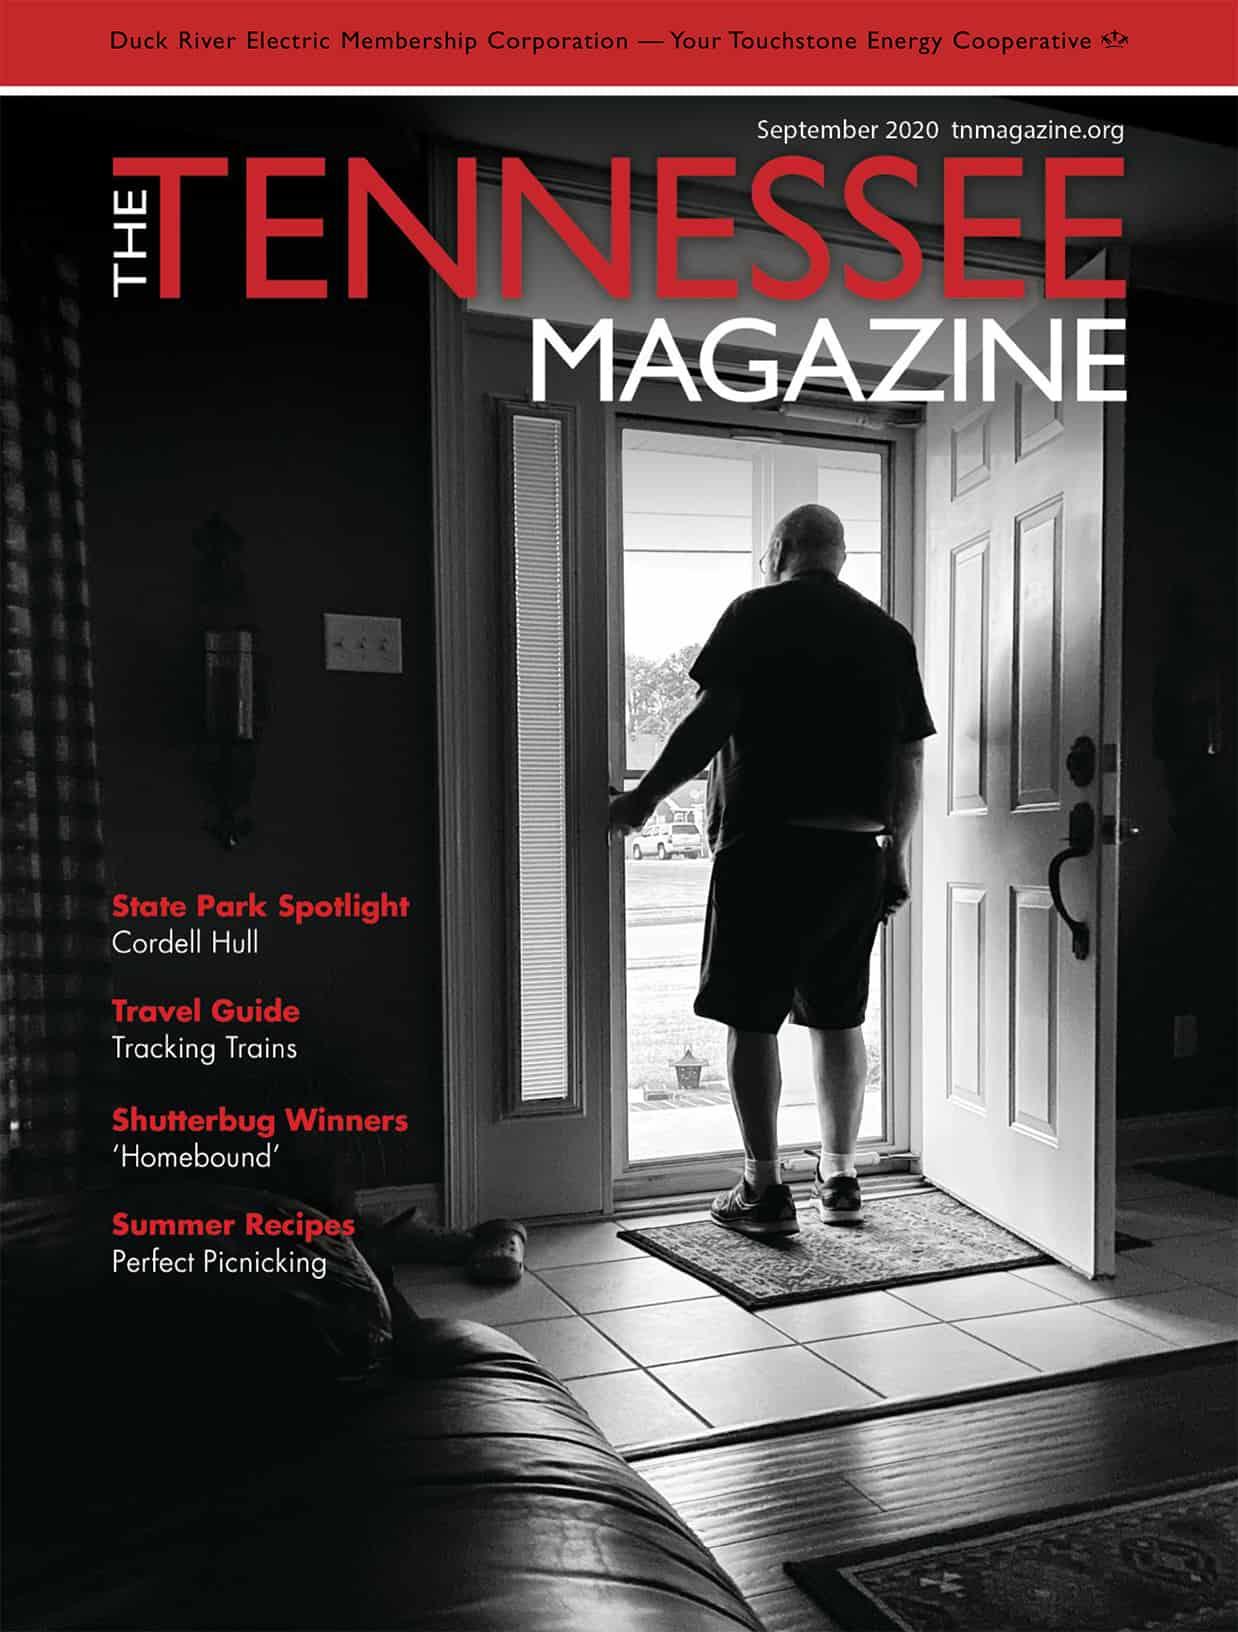 Tennessee Magazine September 2020 Cover